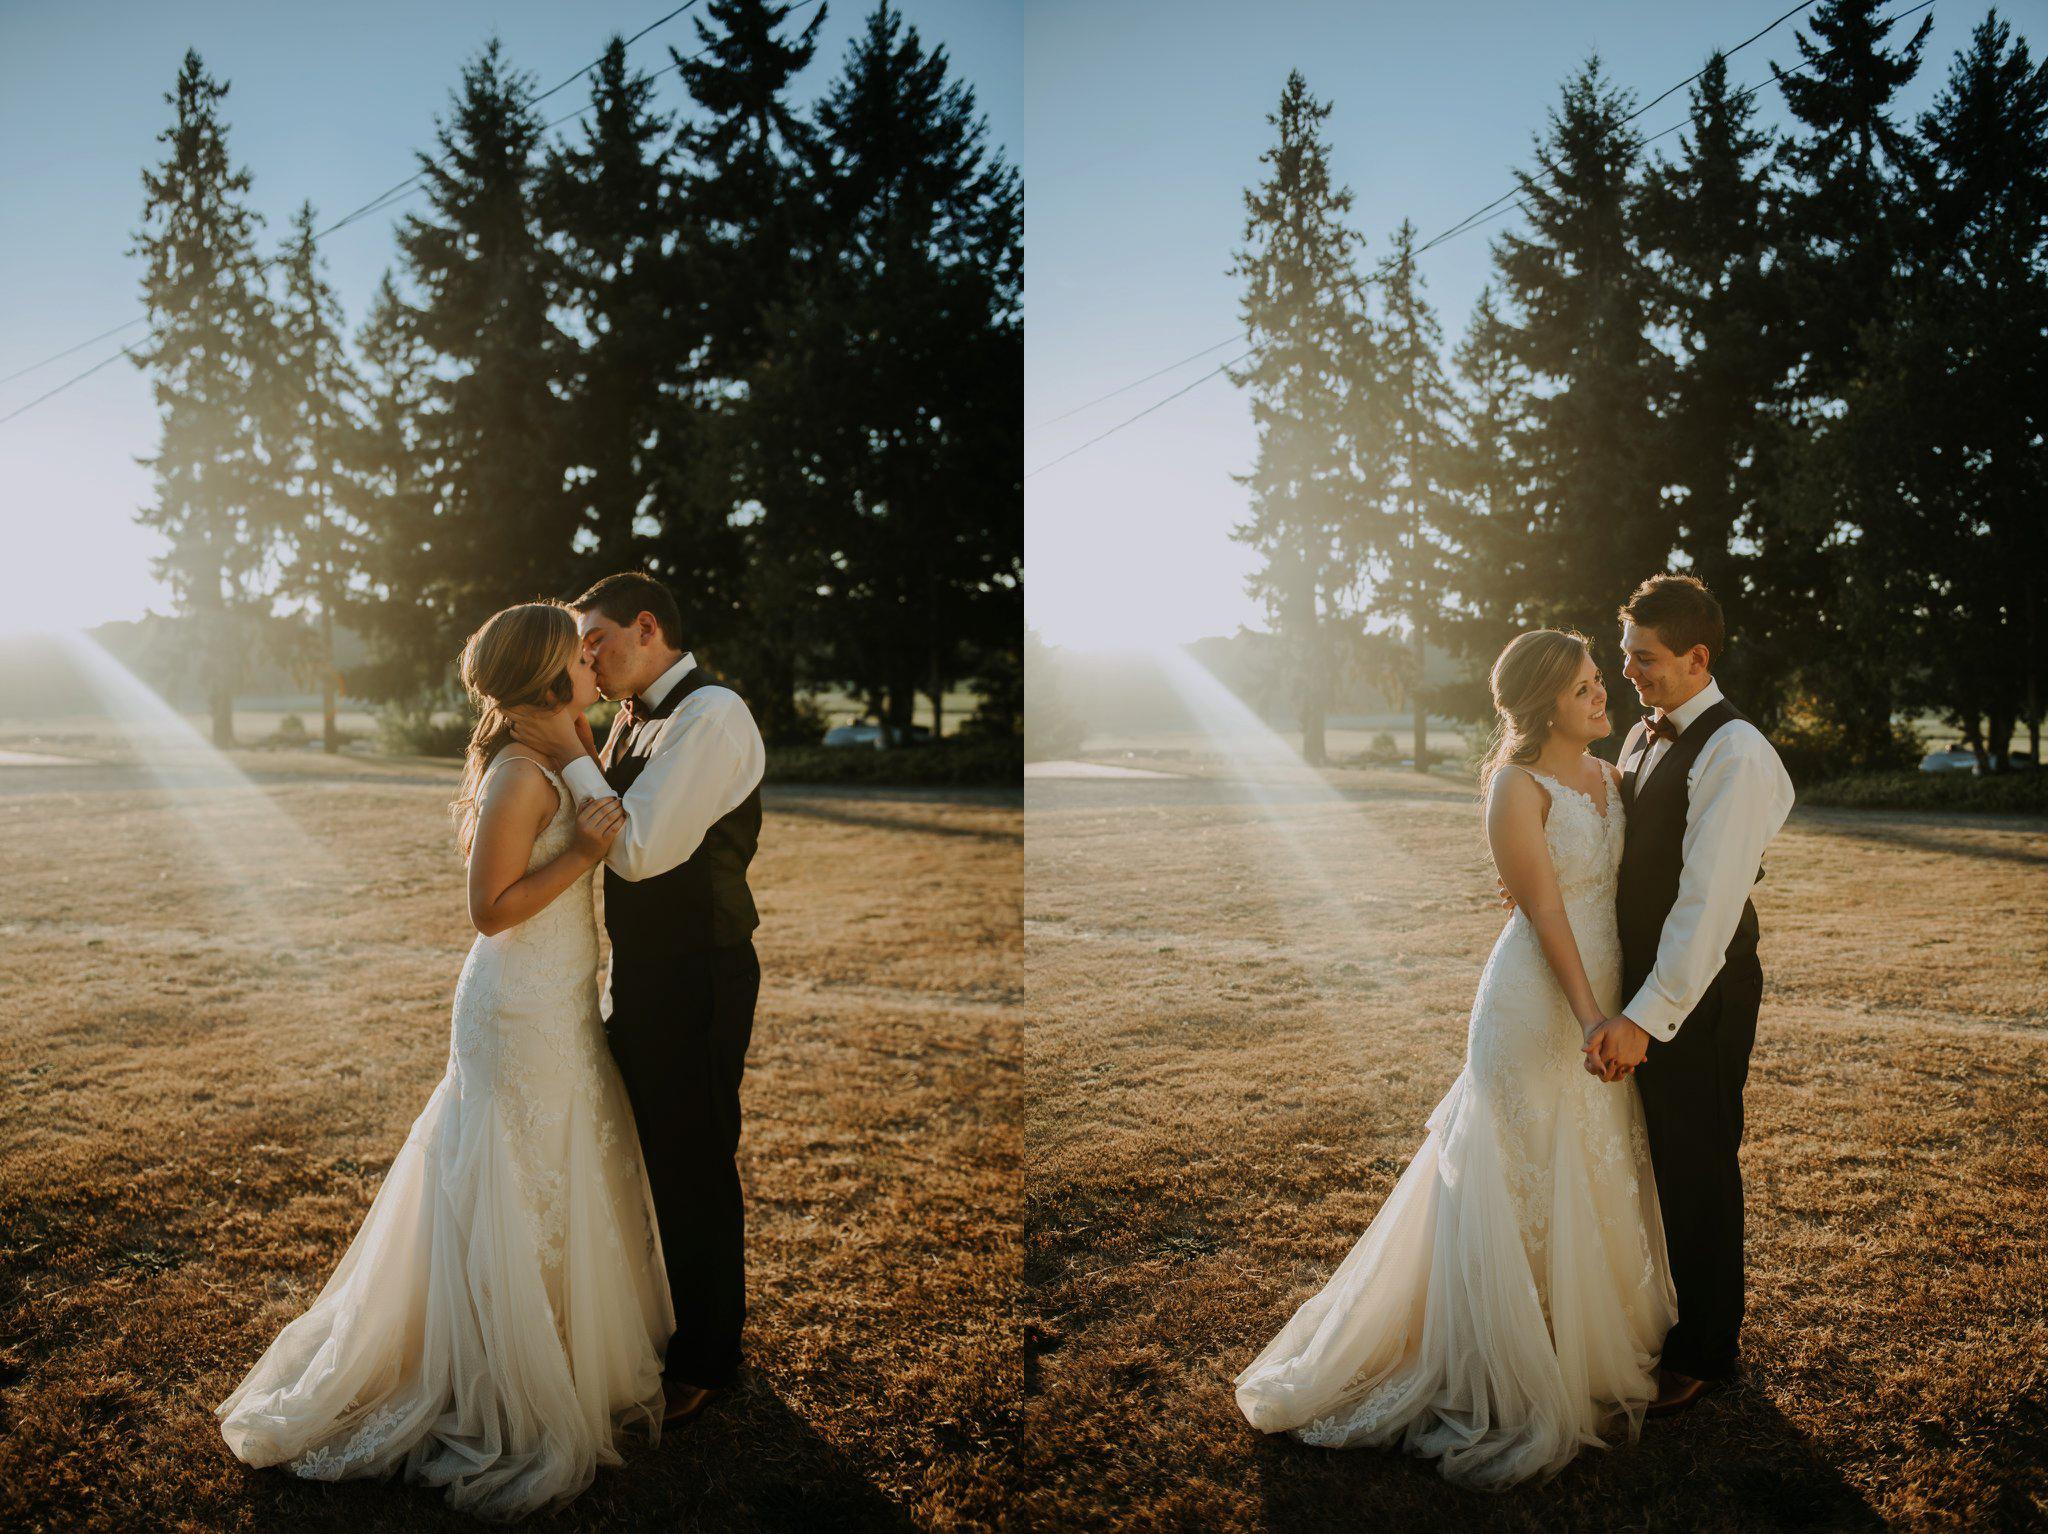 kristen-and-cody-the-kelley-farm-wedding-seattle-photographer-caitlyn-nikula-91.jpg